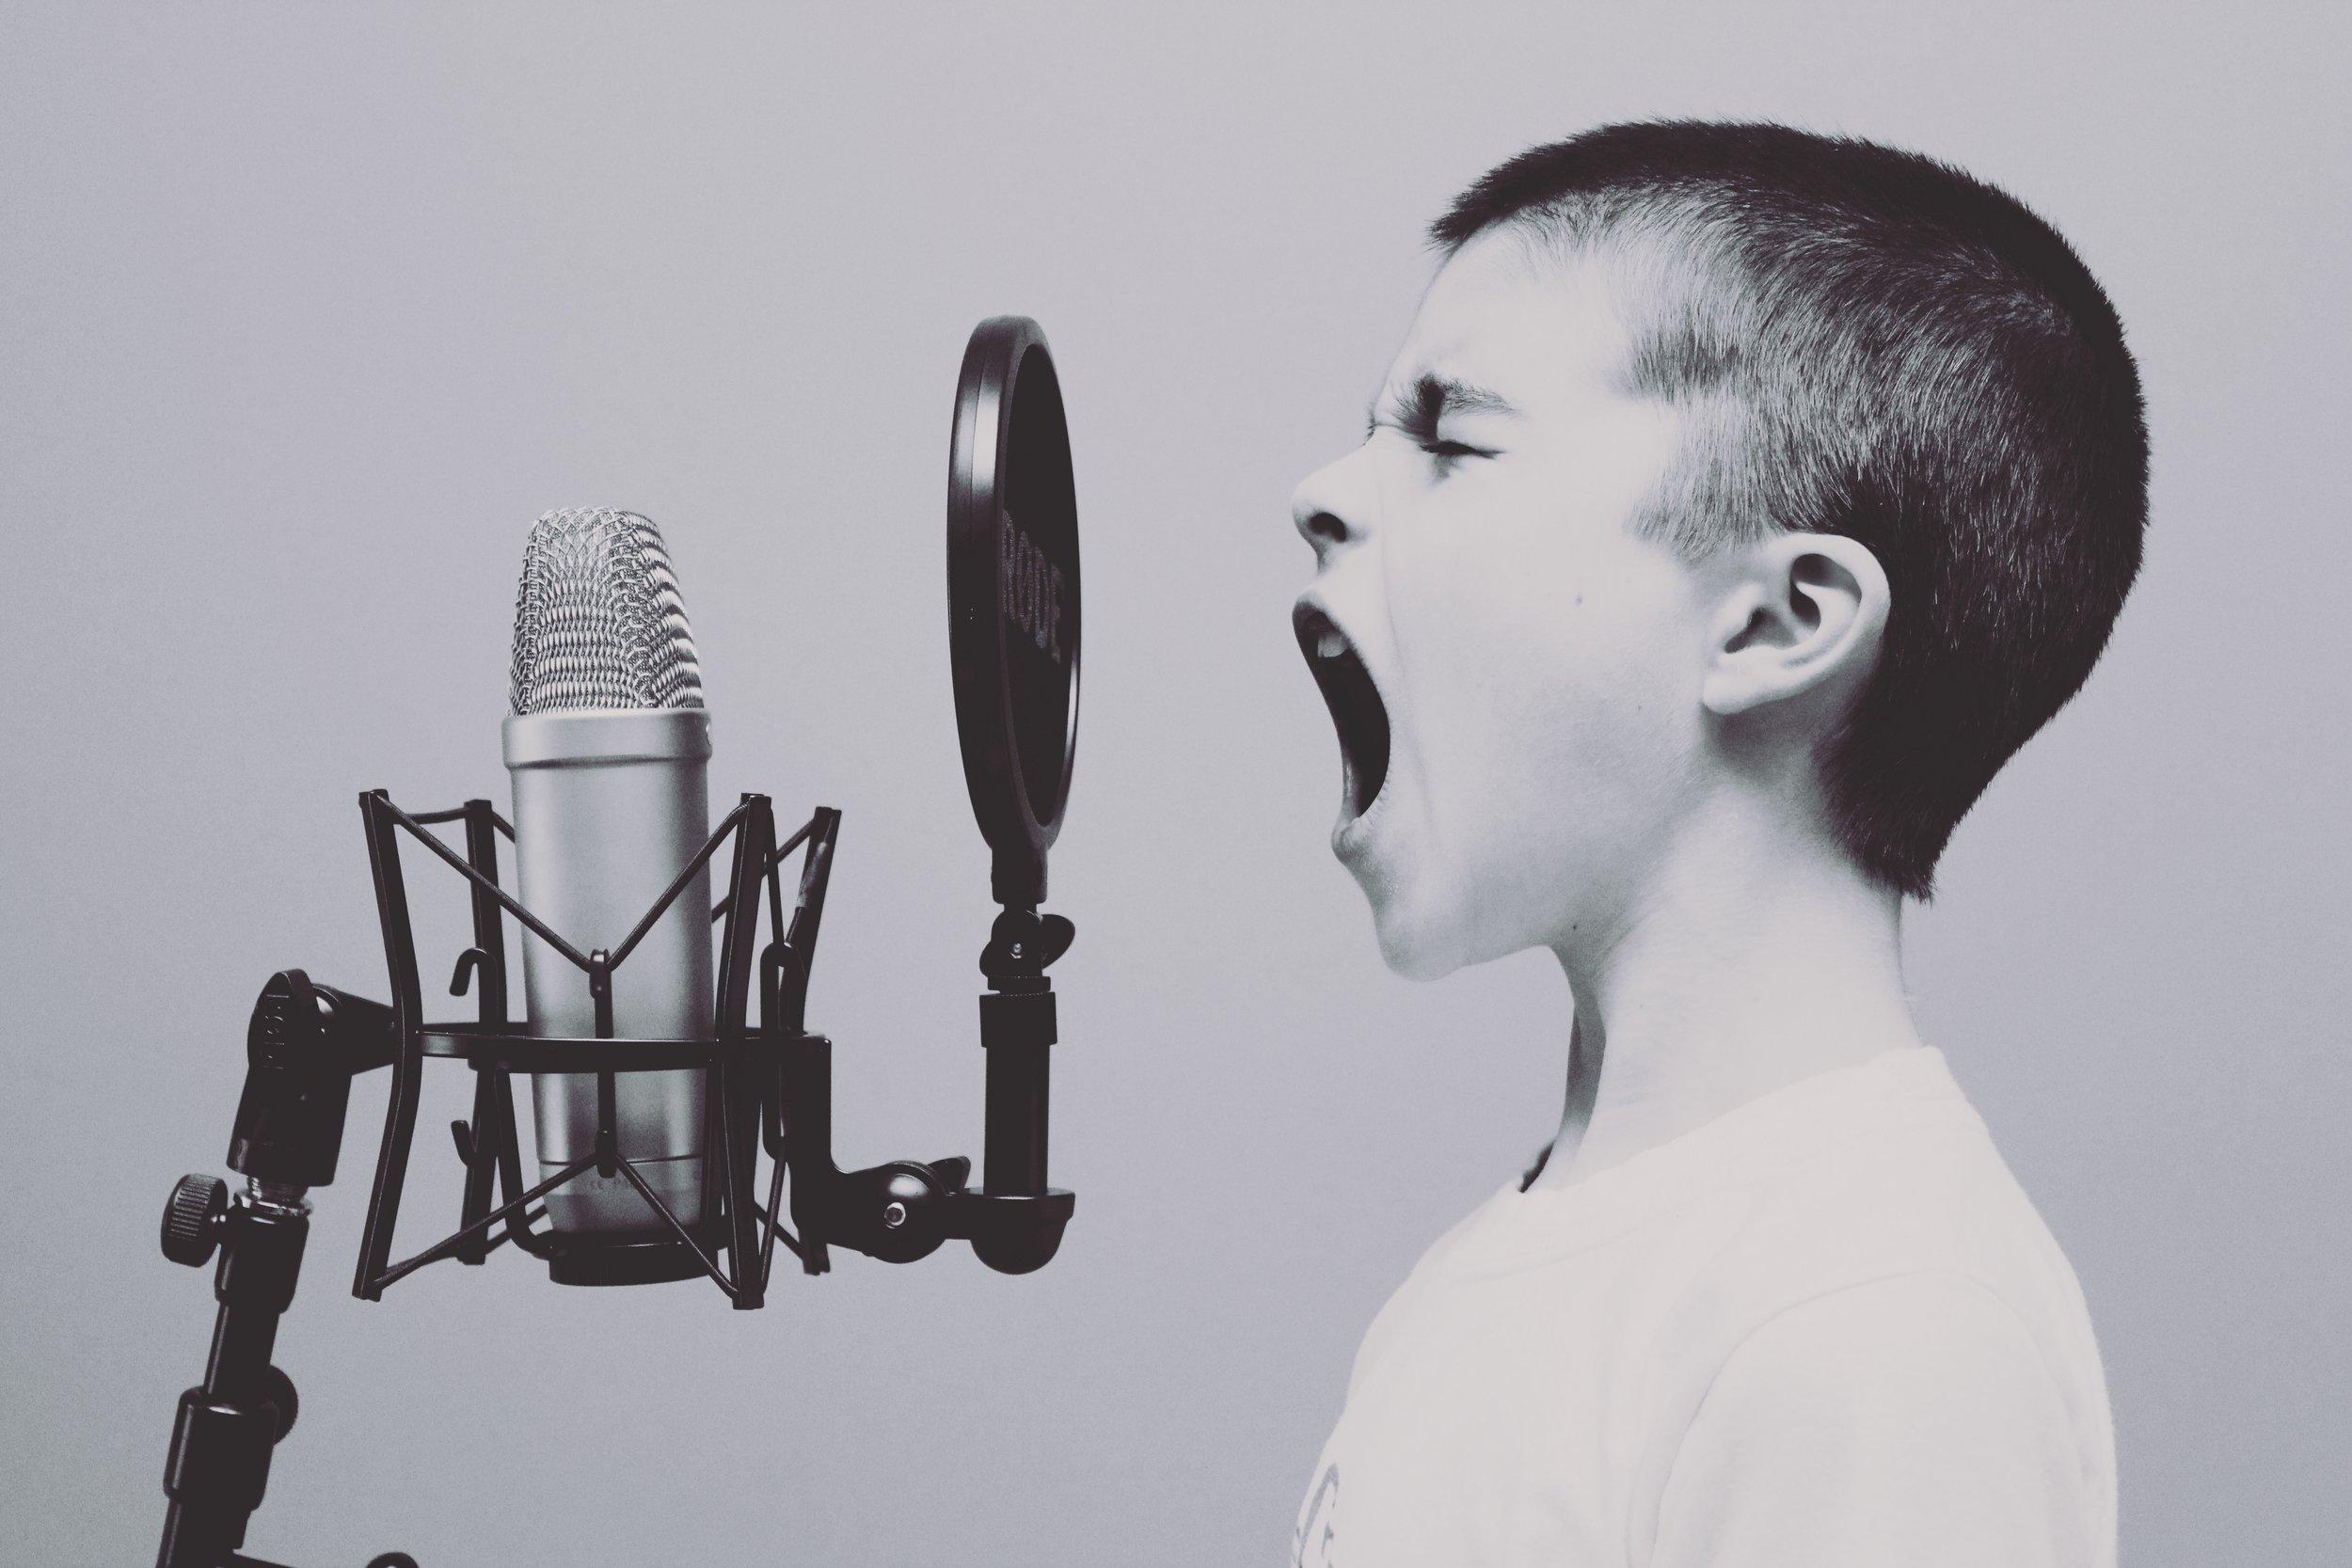 An Evolution: Part 1 - VOICEOVER